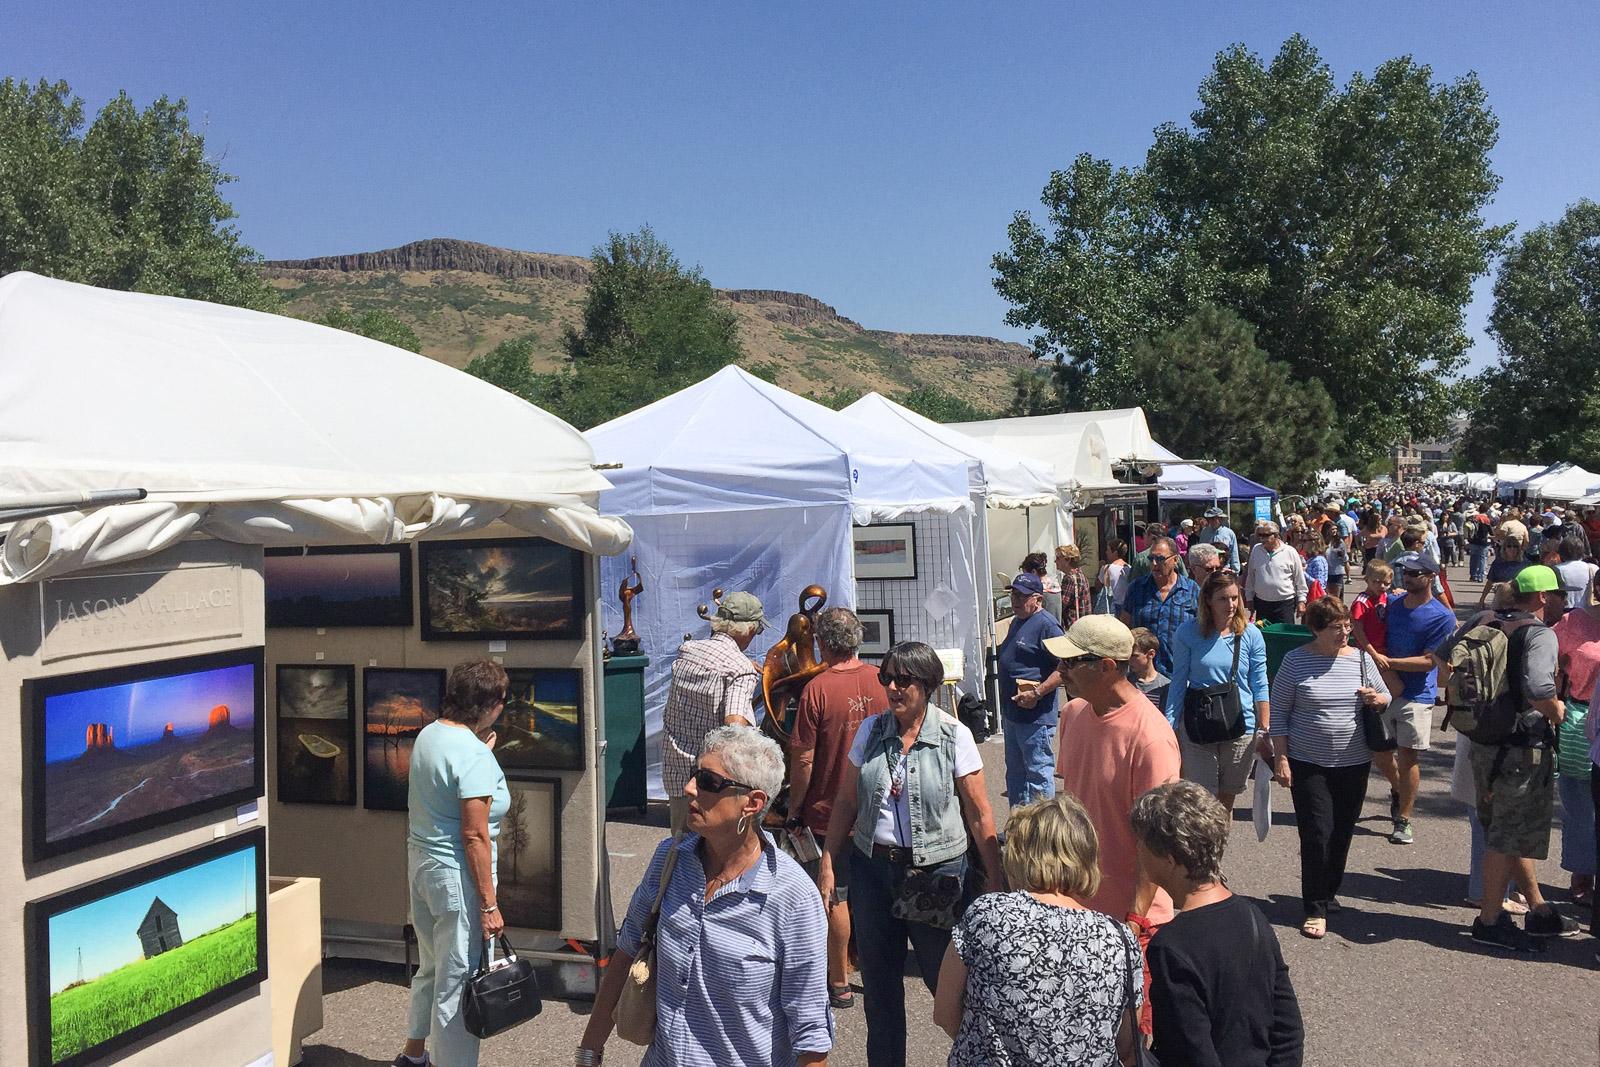 2016-golden-art-festival-crowd